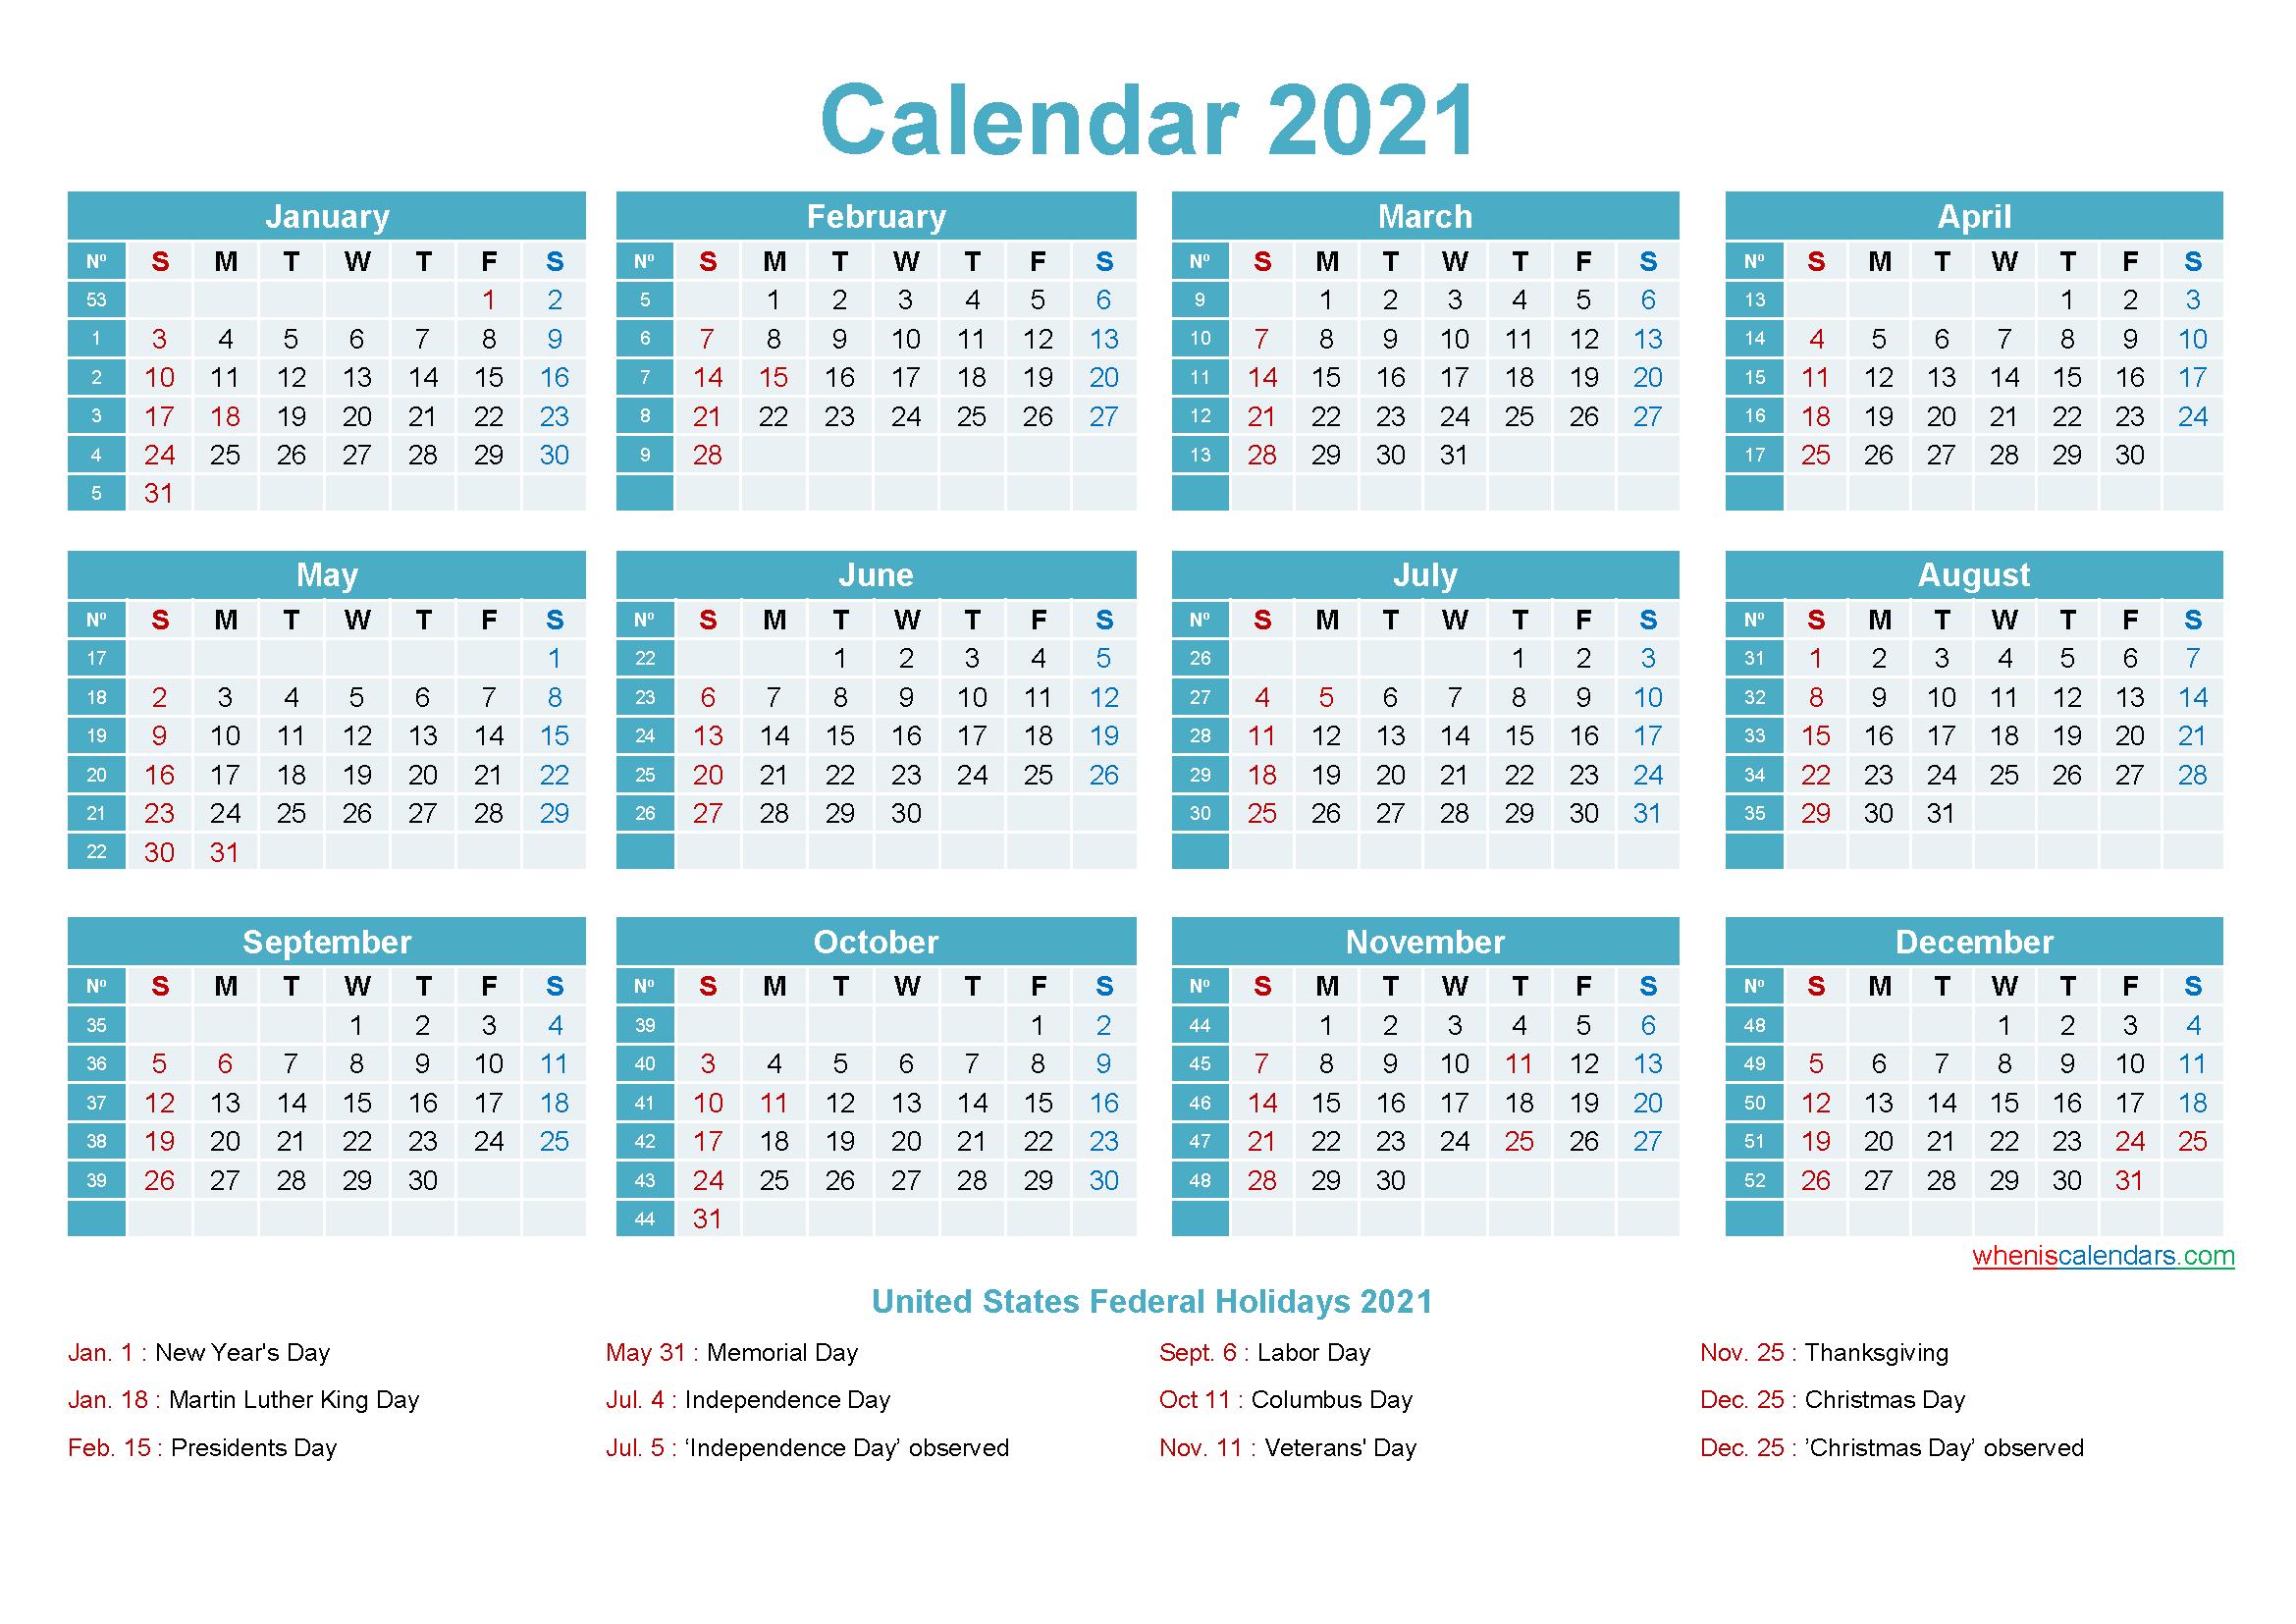 2021 Calendar With Holidays Printable Word, Pdf - Free